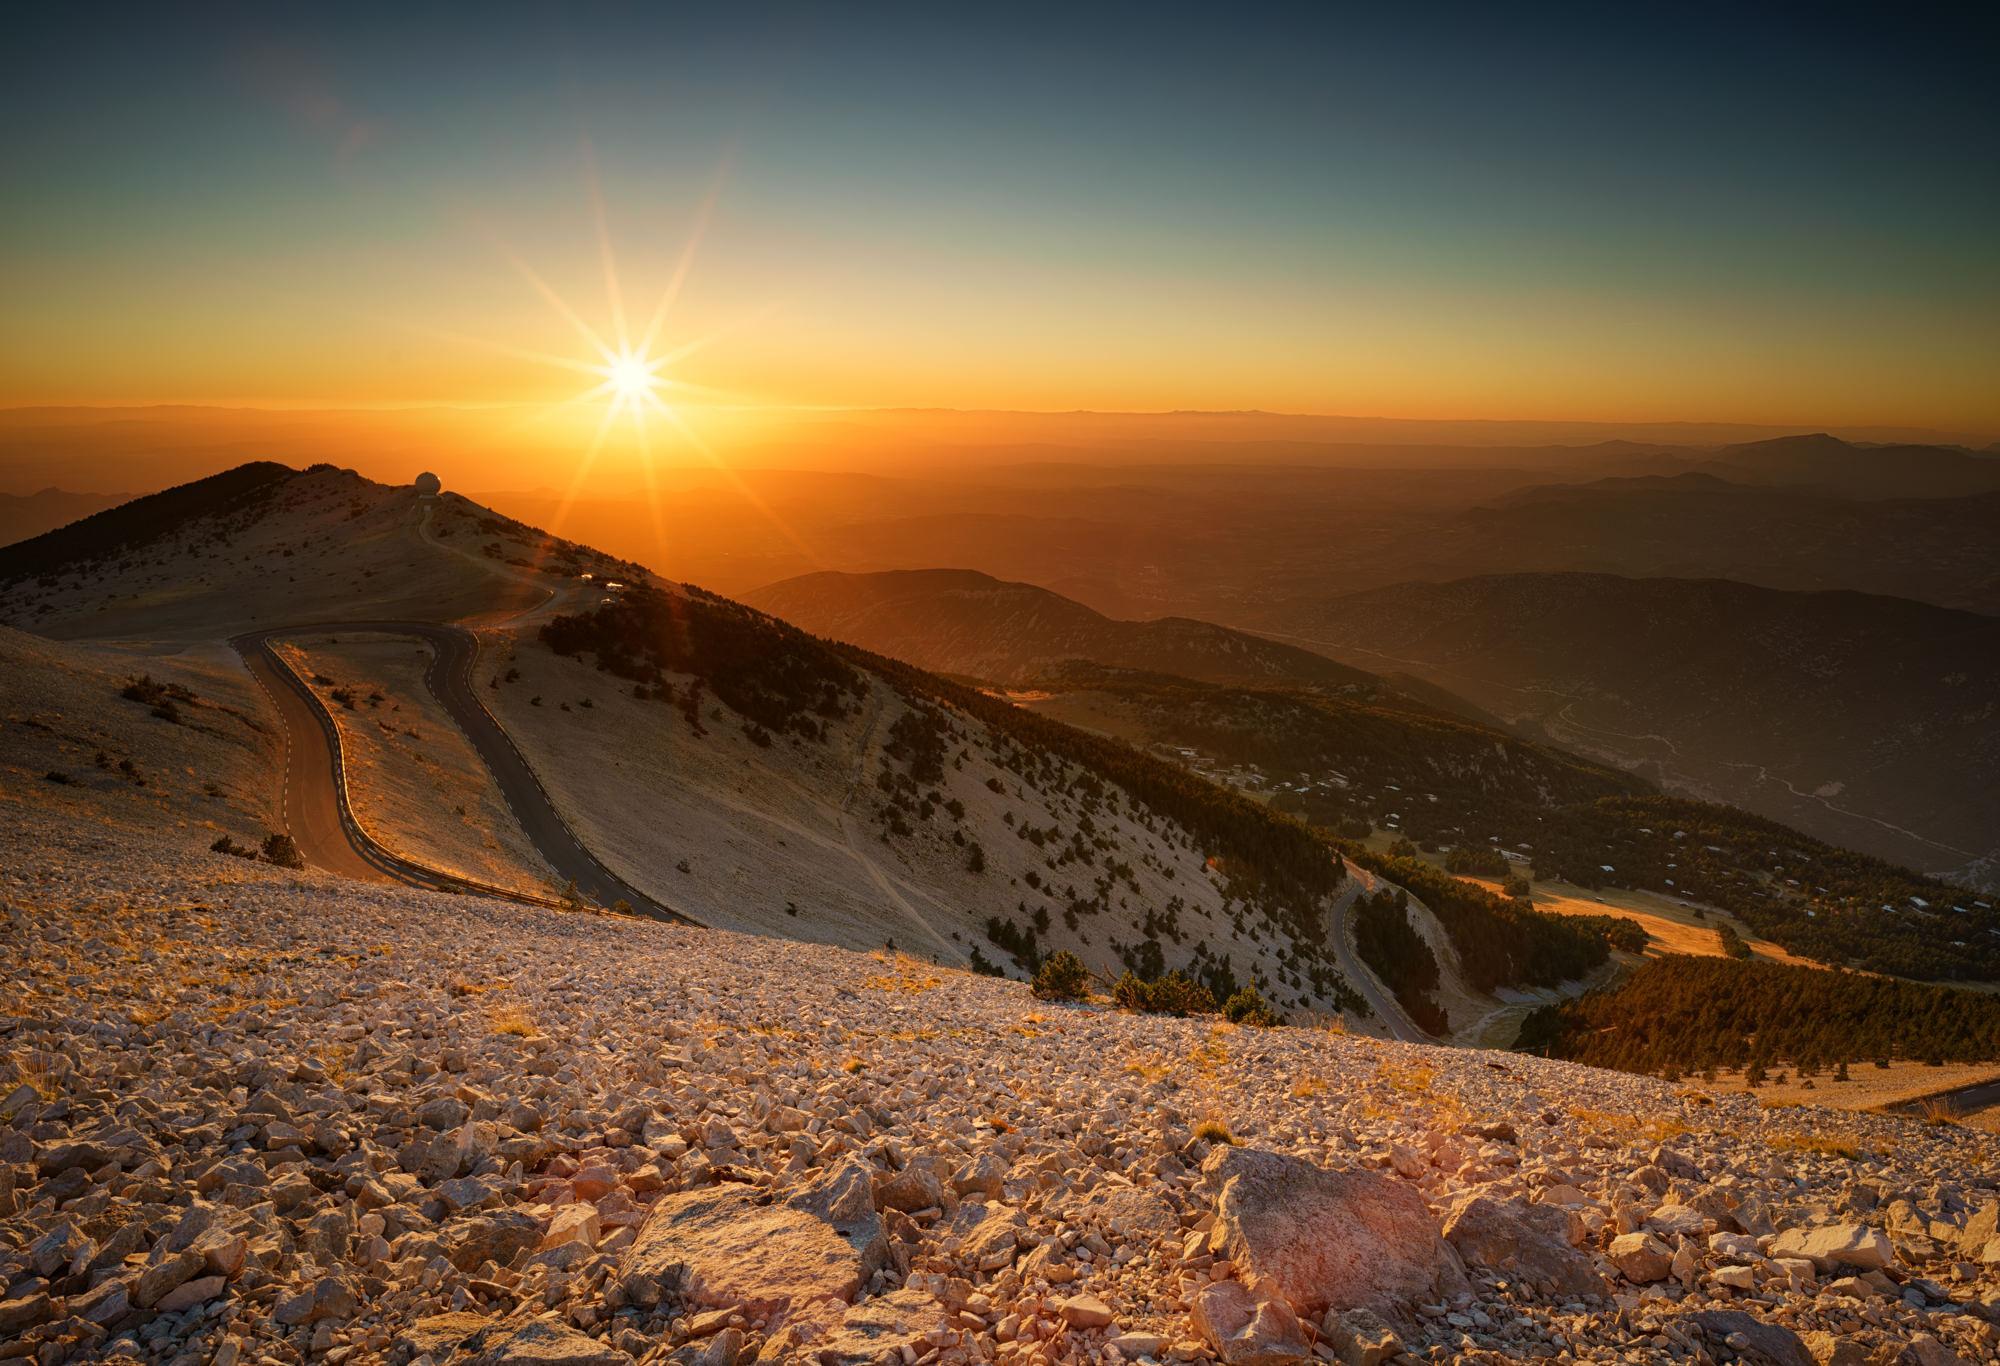 Sunset at Mt Ventoux